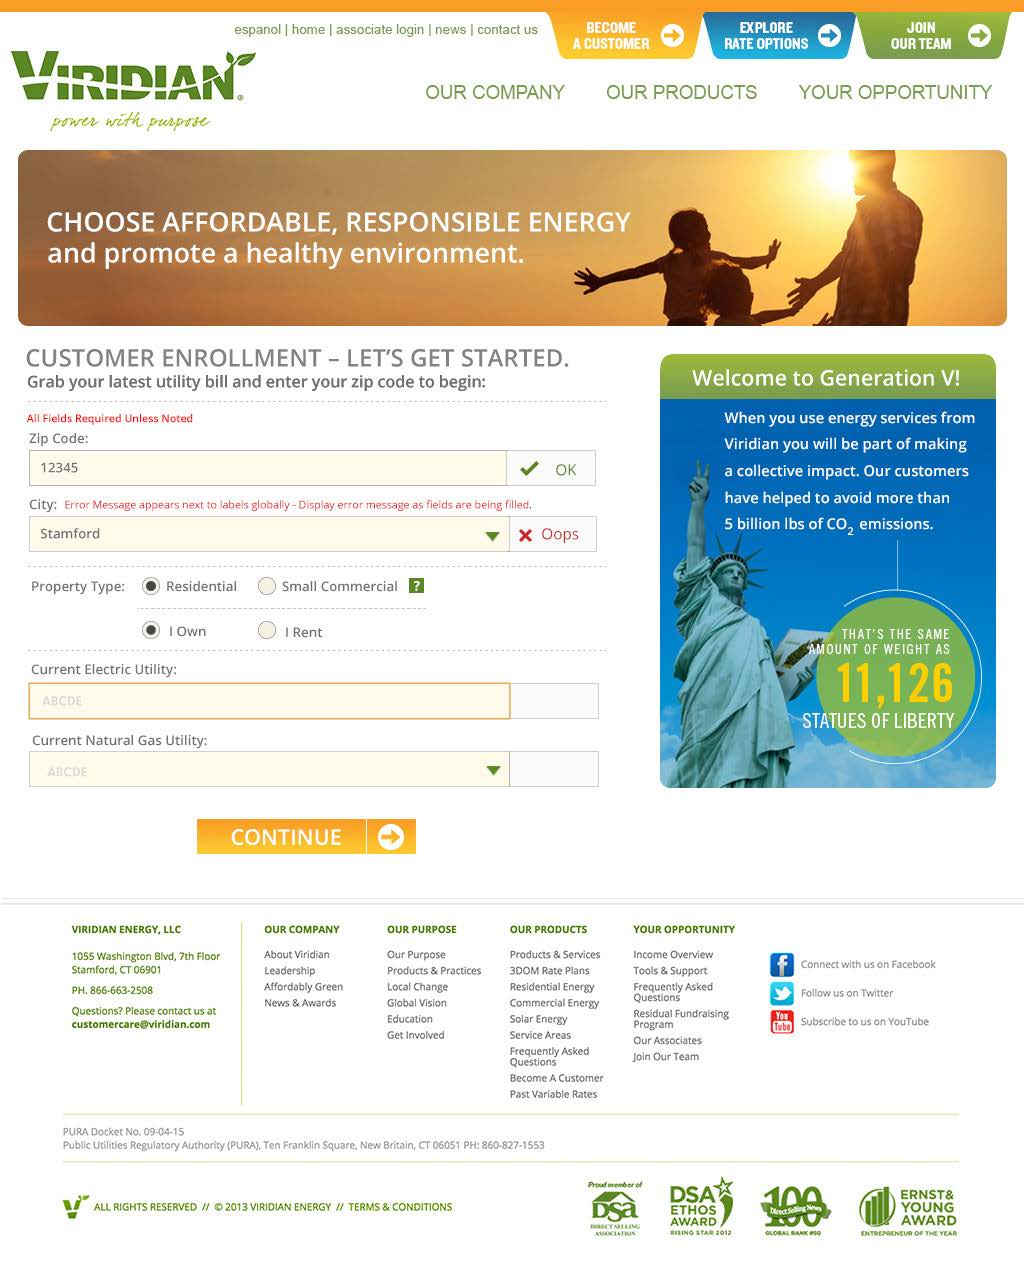 Customer Enrollment Screens 04282015_Page_01